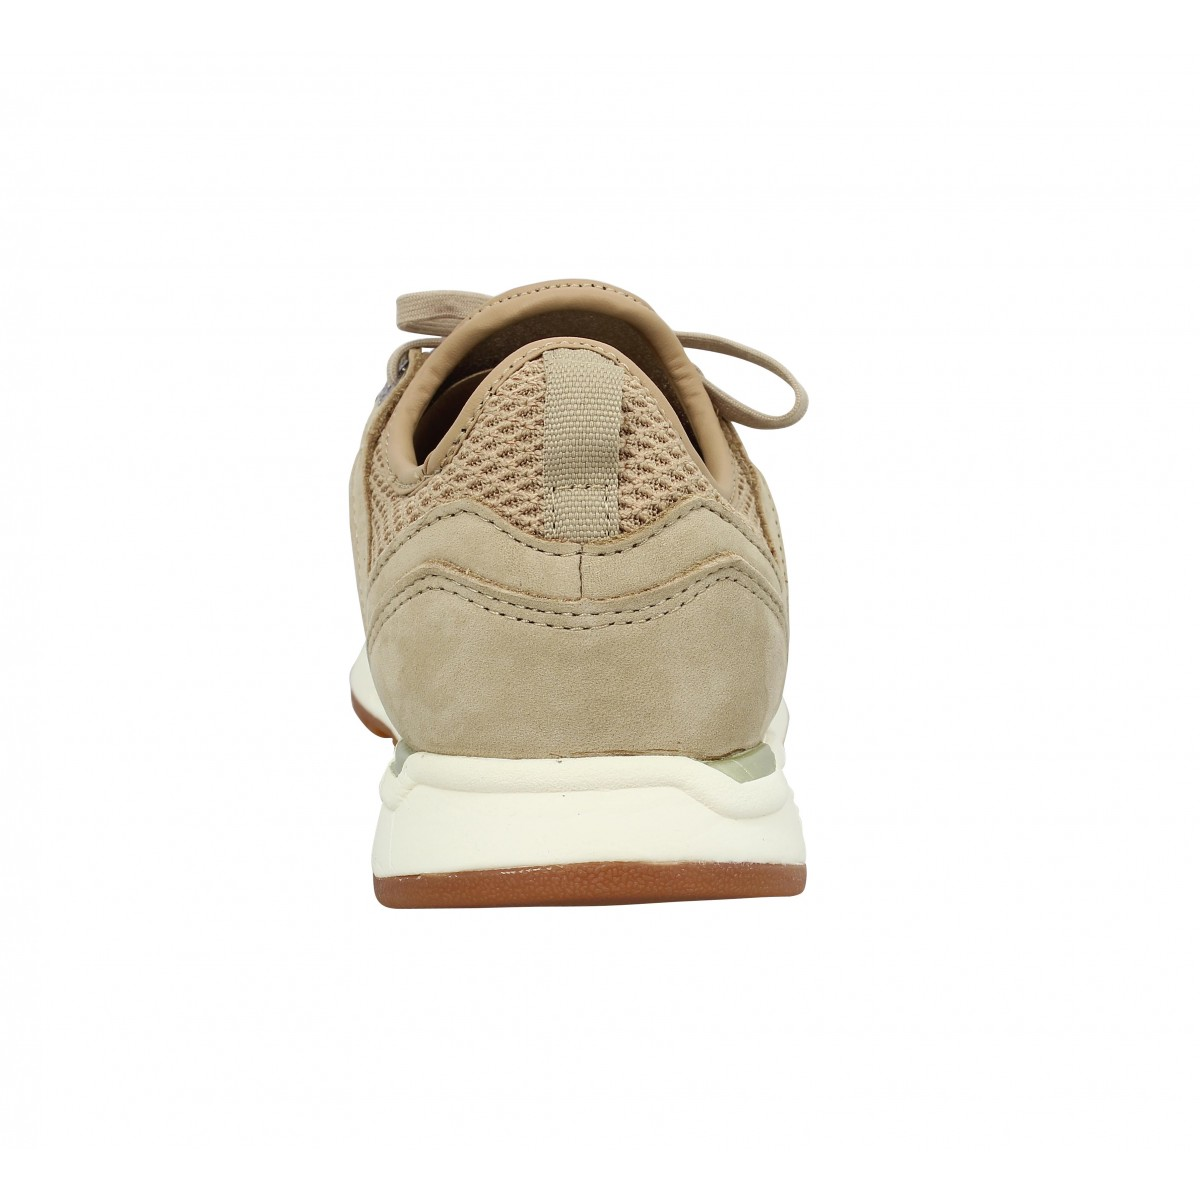 Chaussures New balance 247 nubuck femme beige femme   Fanny chaussures